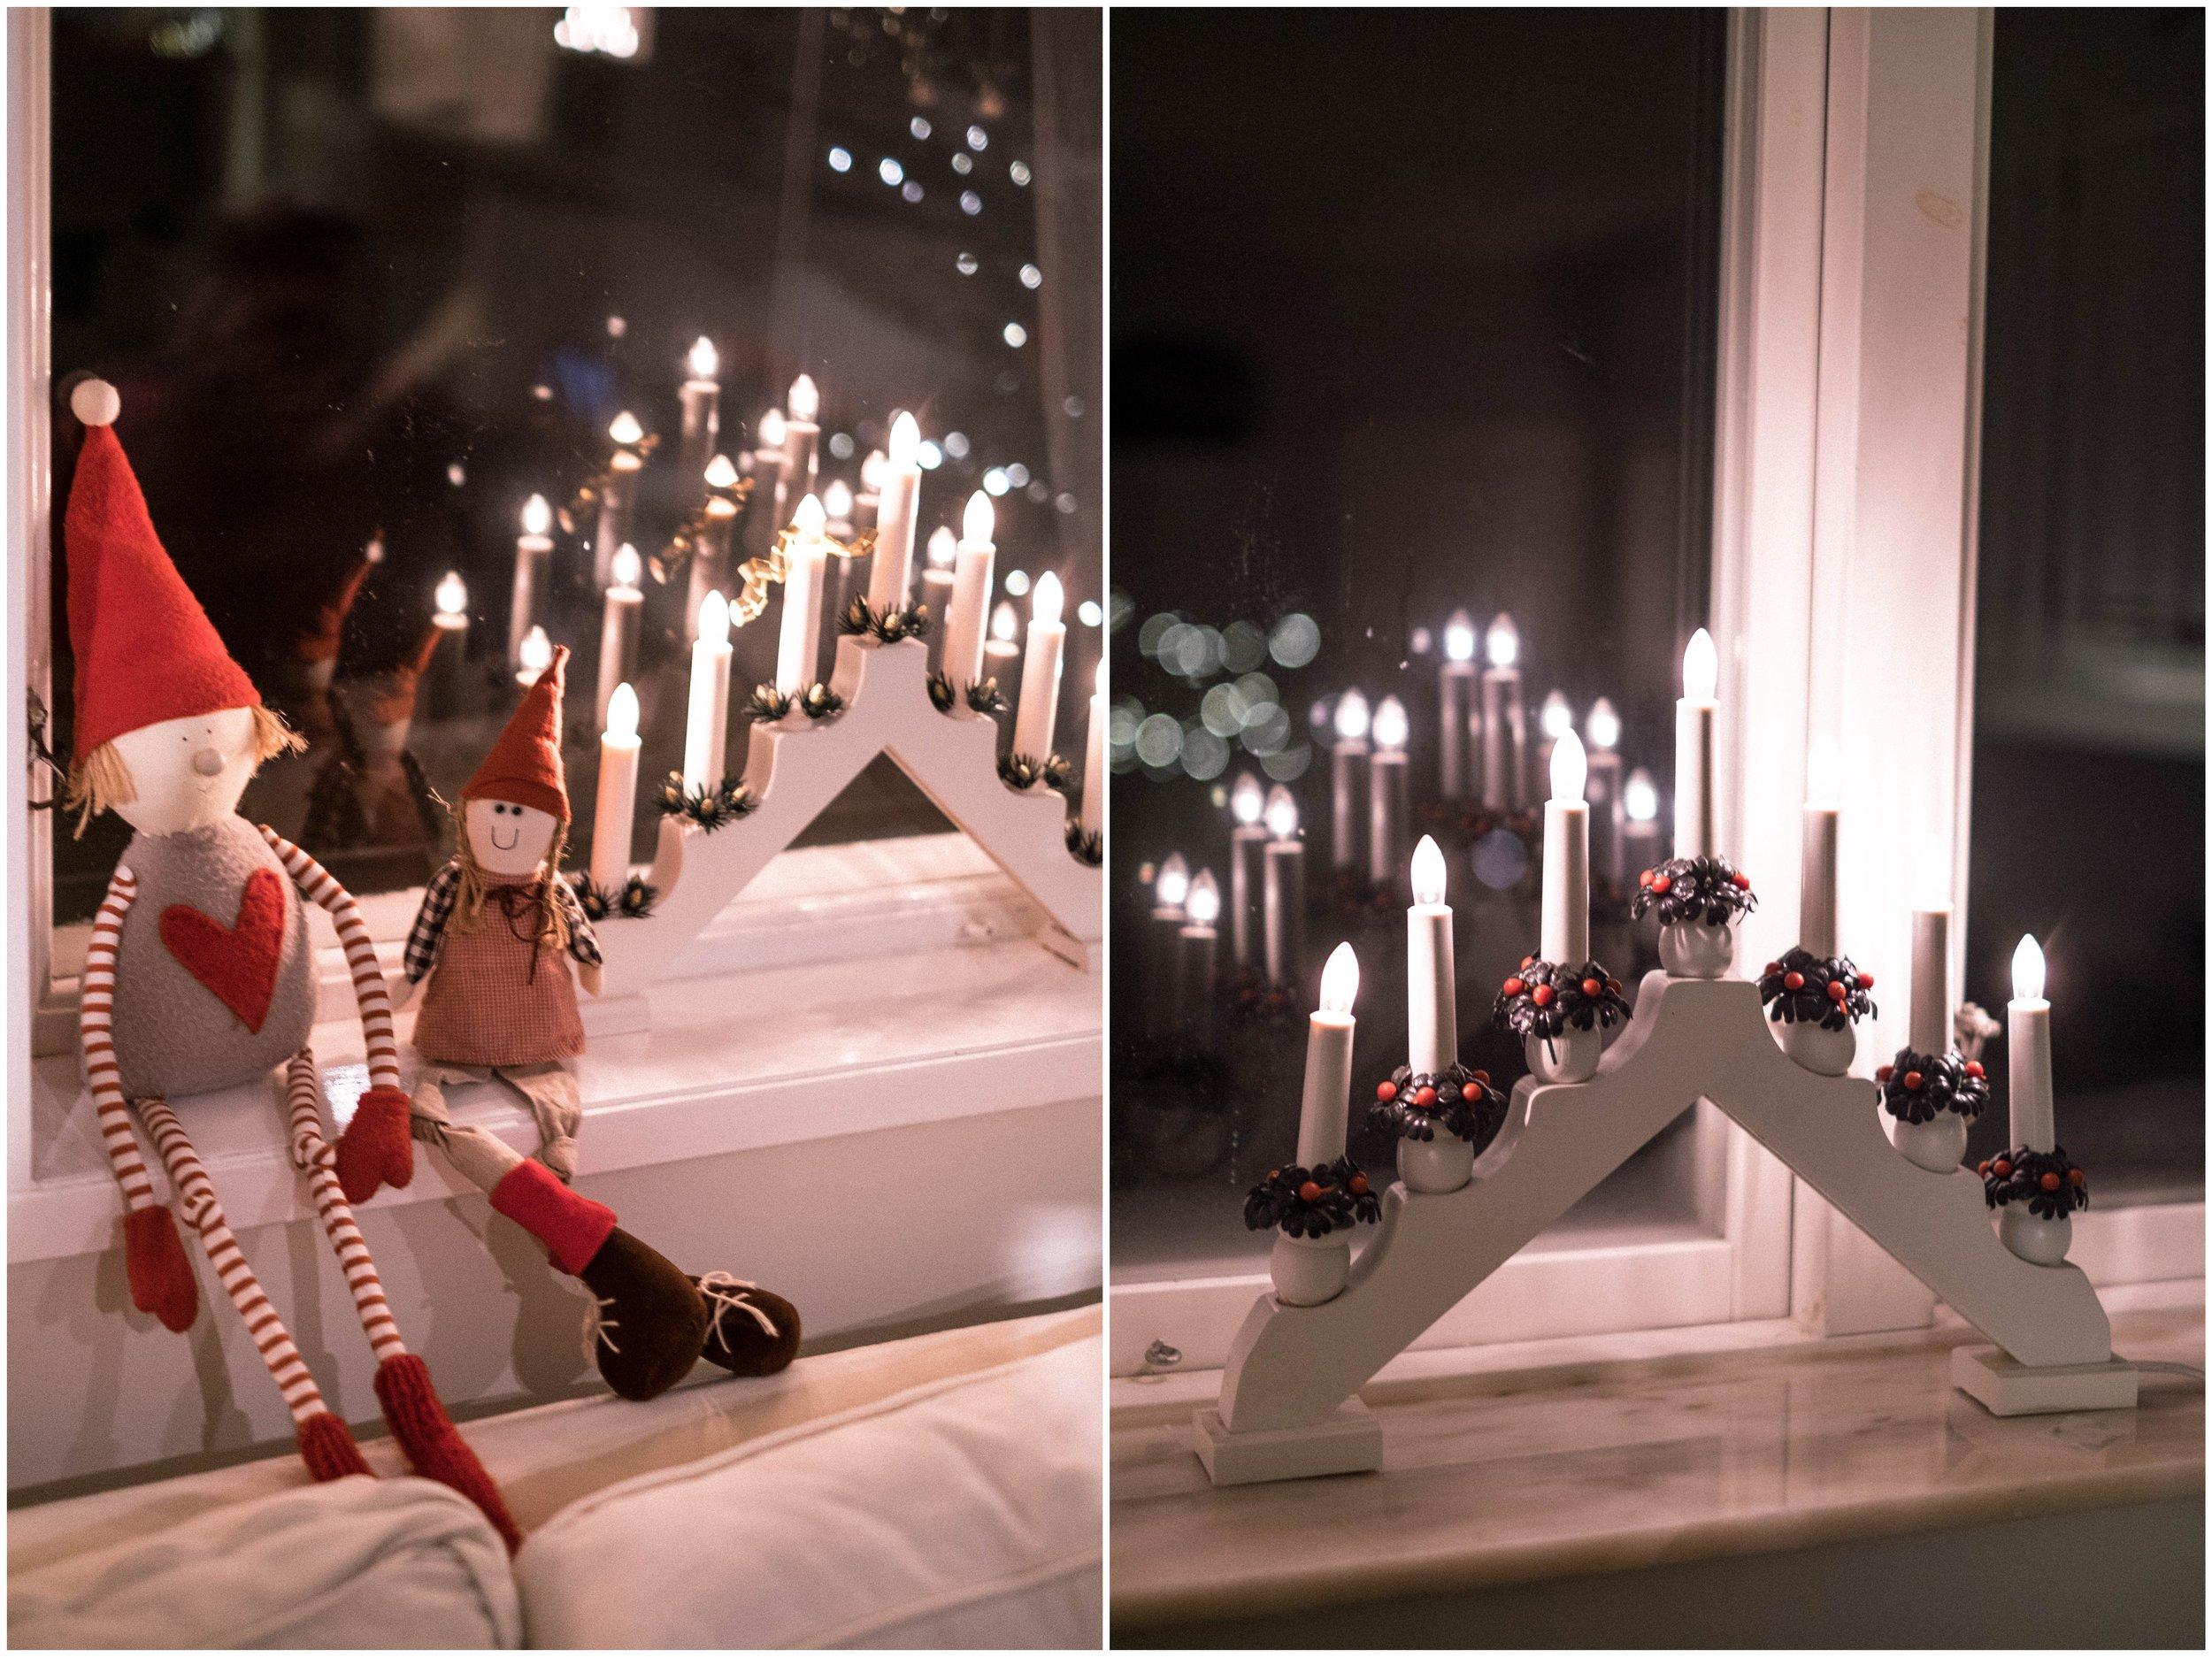 Christmas in Ljunghusen, Sweden 2017 Olivia Vranjes 103.jpg